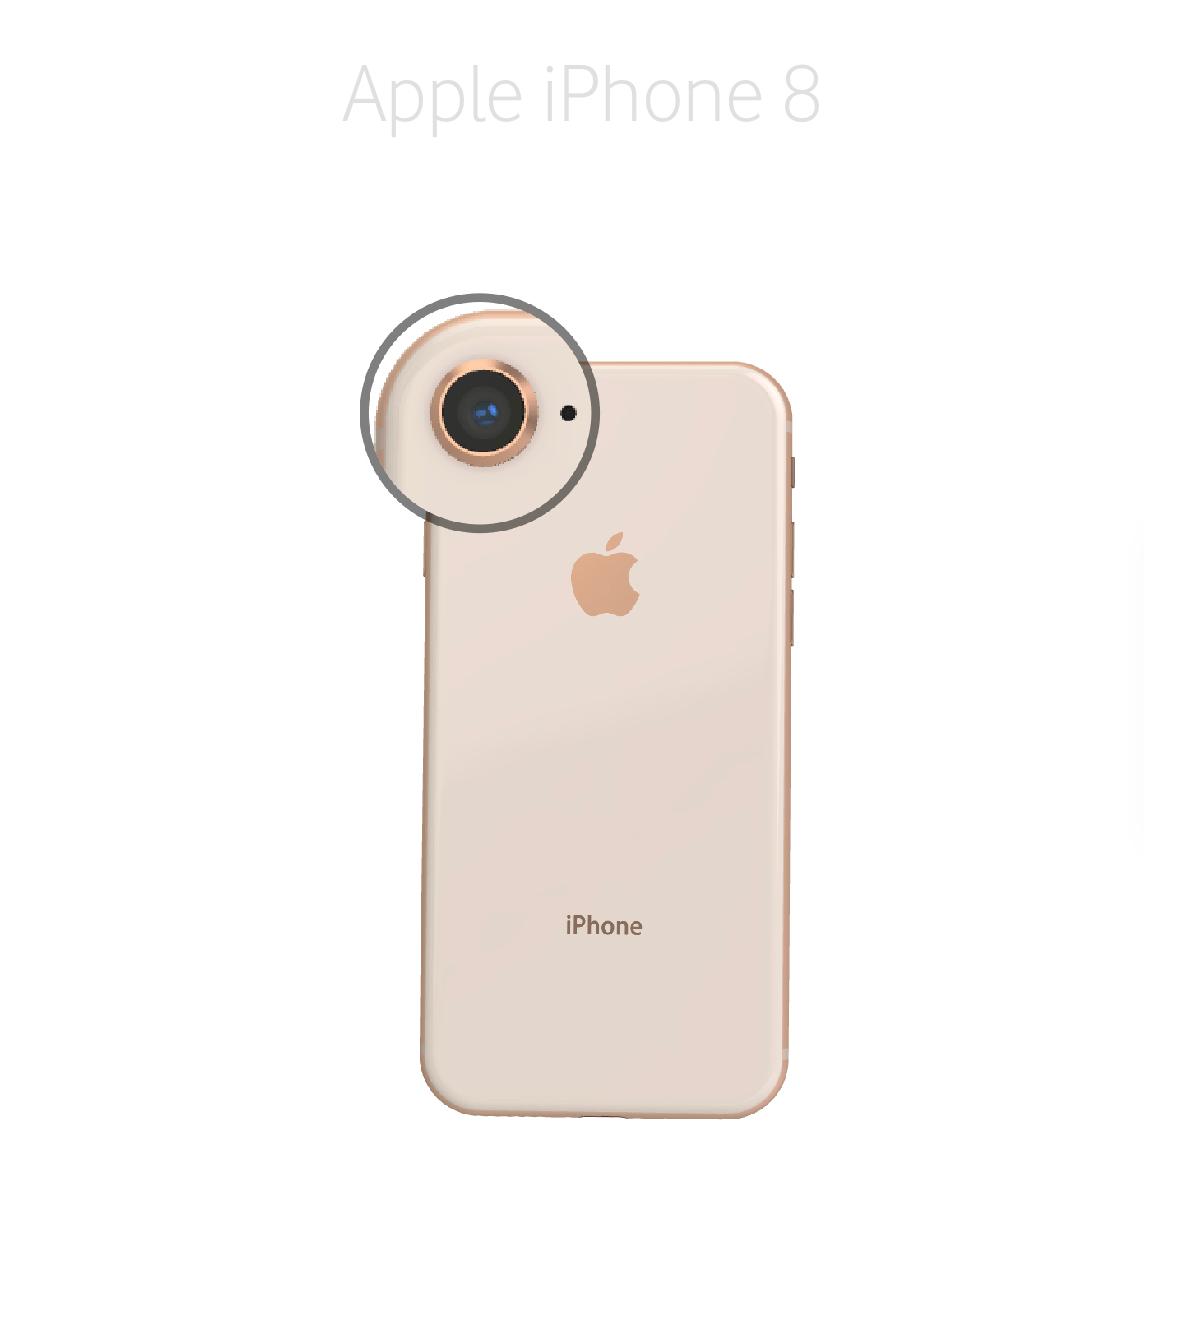 Laga mikrofon kamera iPhone 8